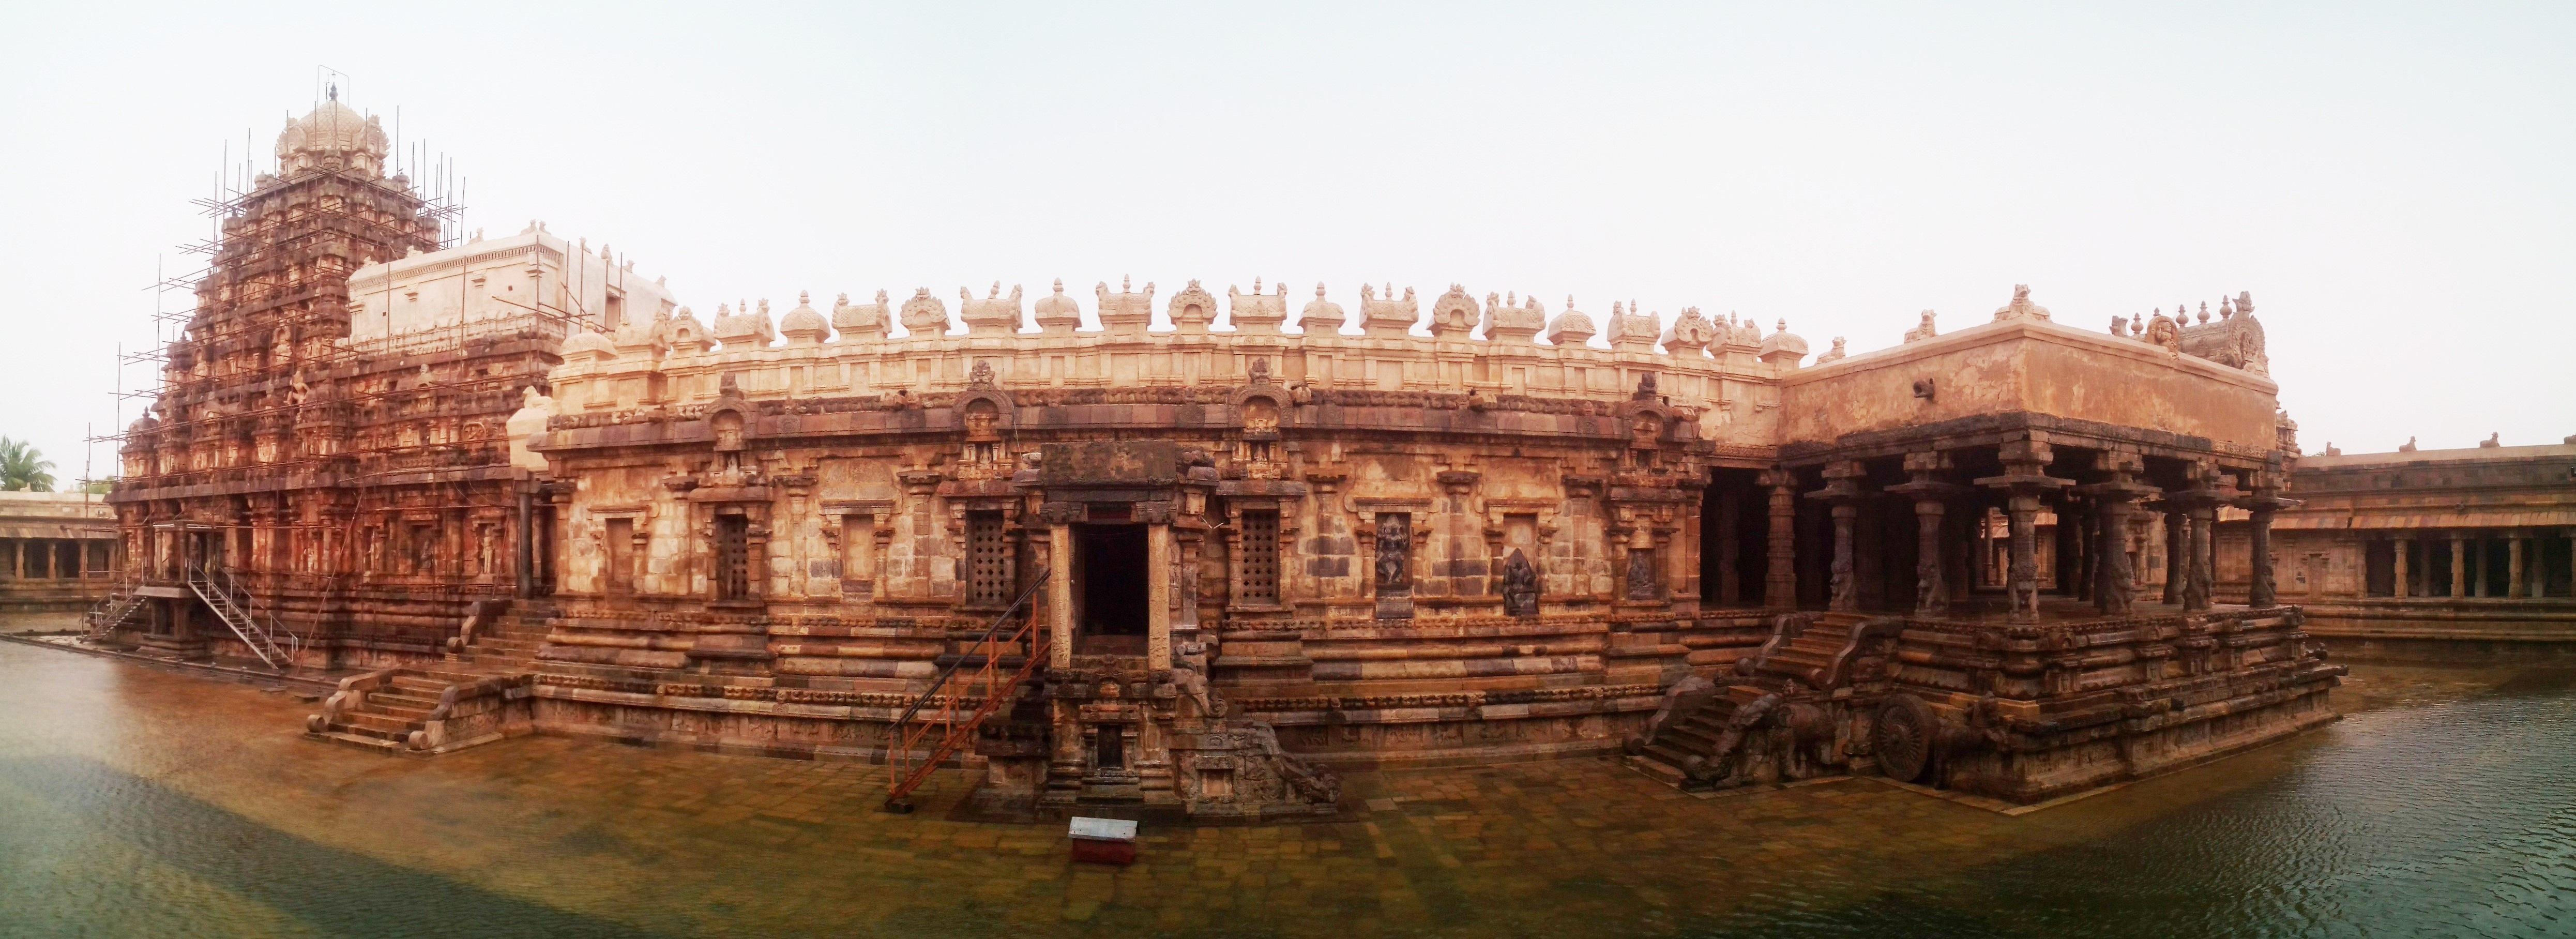 Airavateshwara temple at Darasuram, partially submerged during the rain